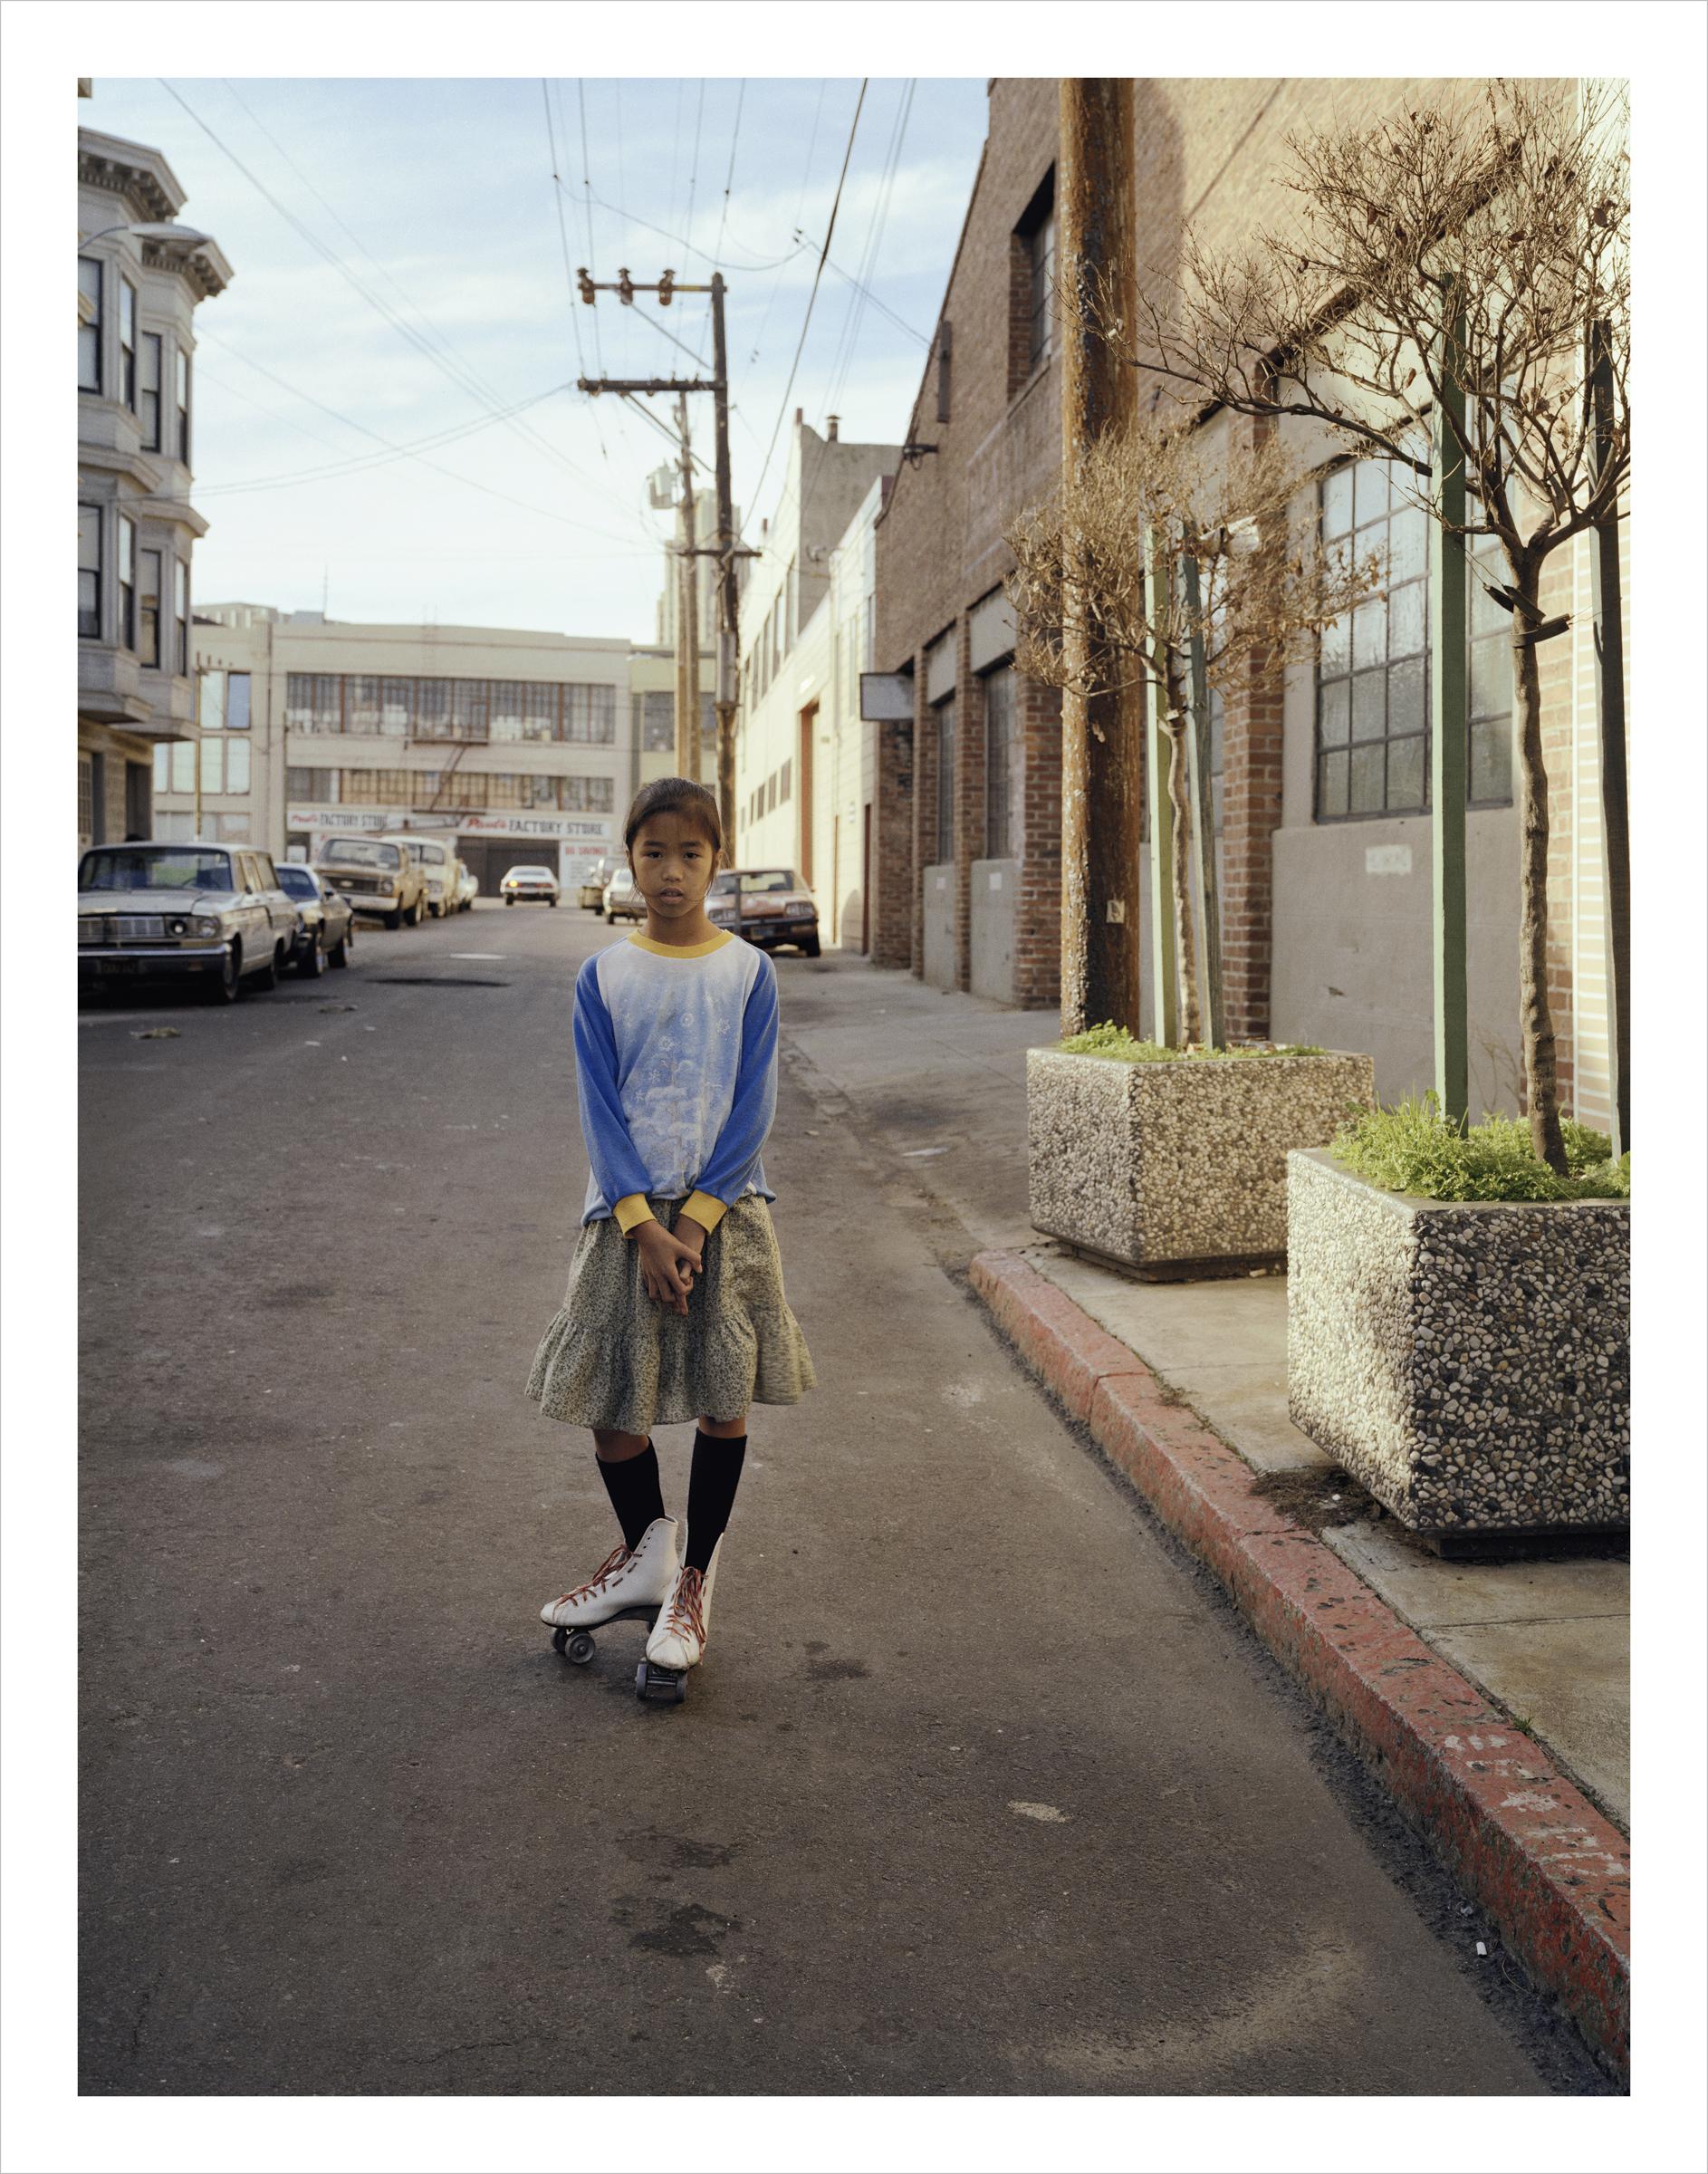 Marie on Skates, Langton Street, 1981 Archival Pigment Print, 2016 16 x 20 inches, edition of 5 20 x 24 inches, edition of 2 30 x 40 inches, edition of 2